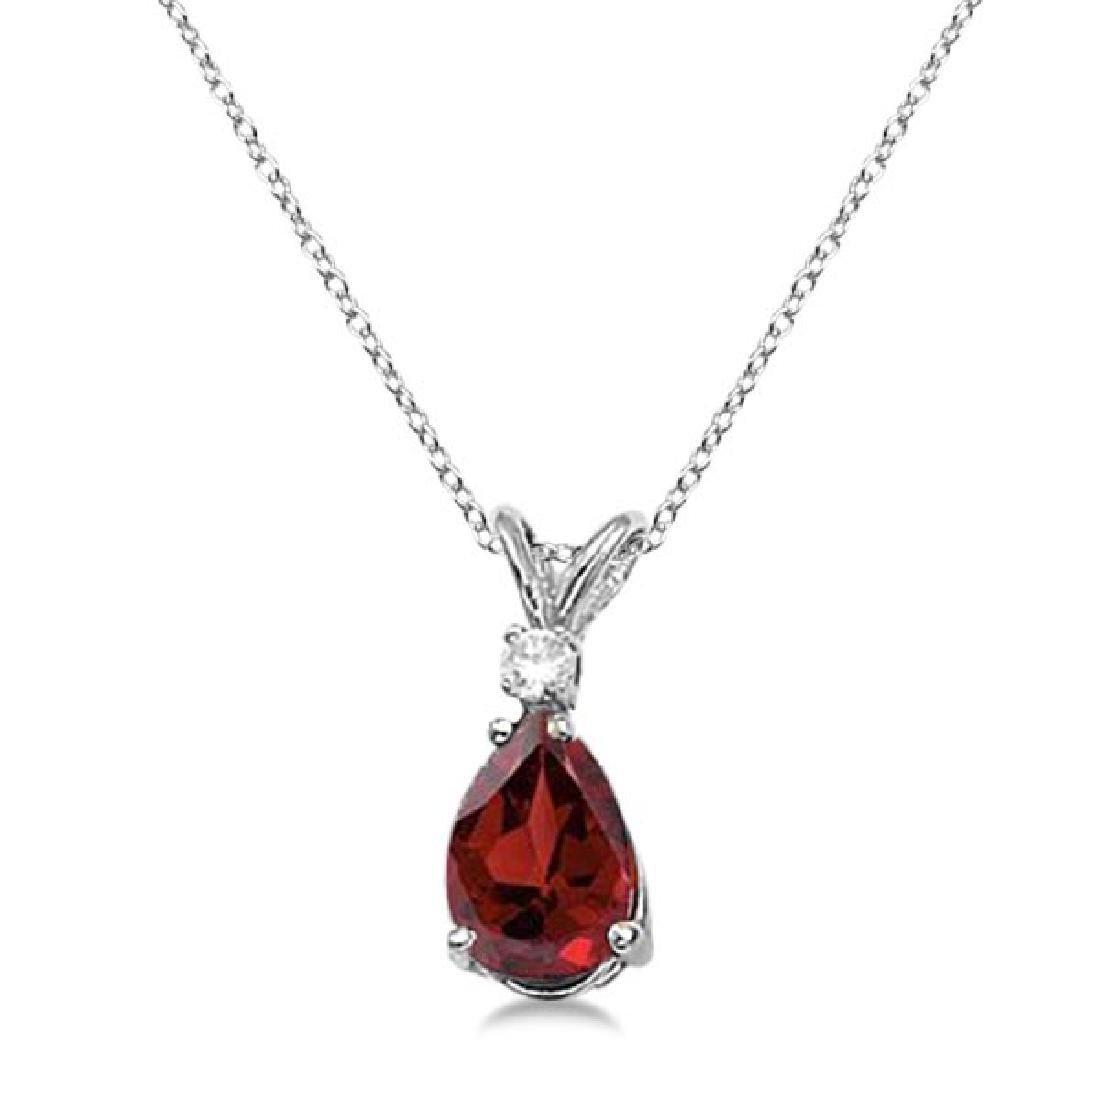 Pear Garnet and Diamond Solitaire Pendant Necklace 14k